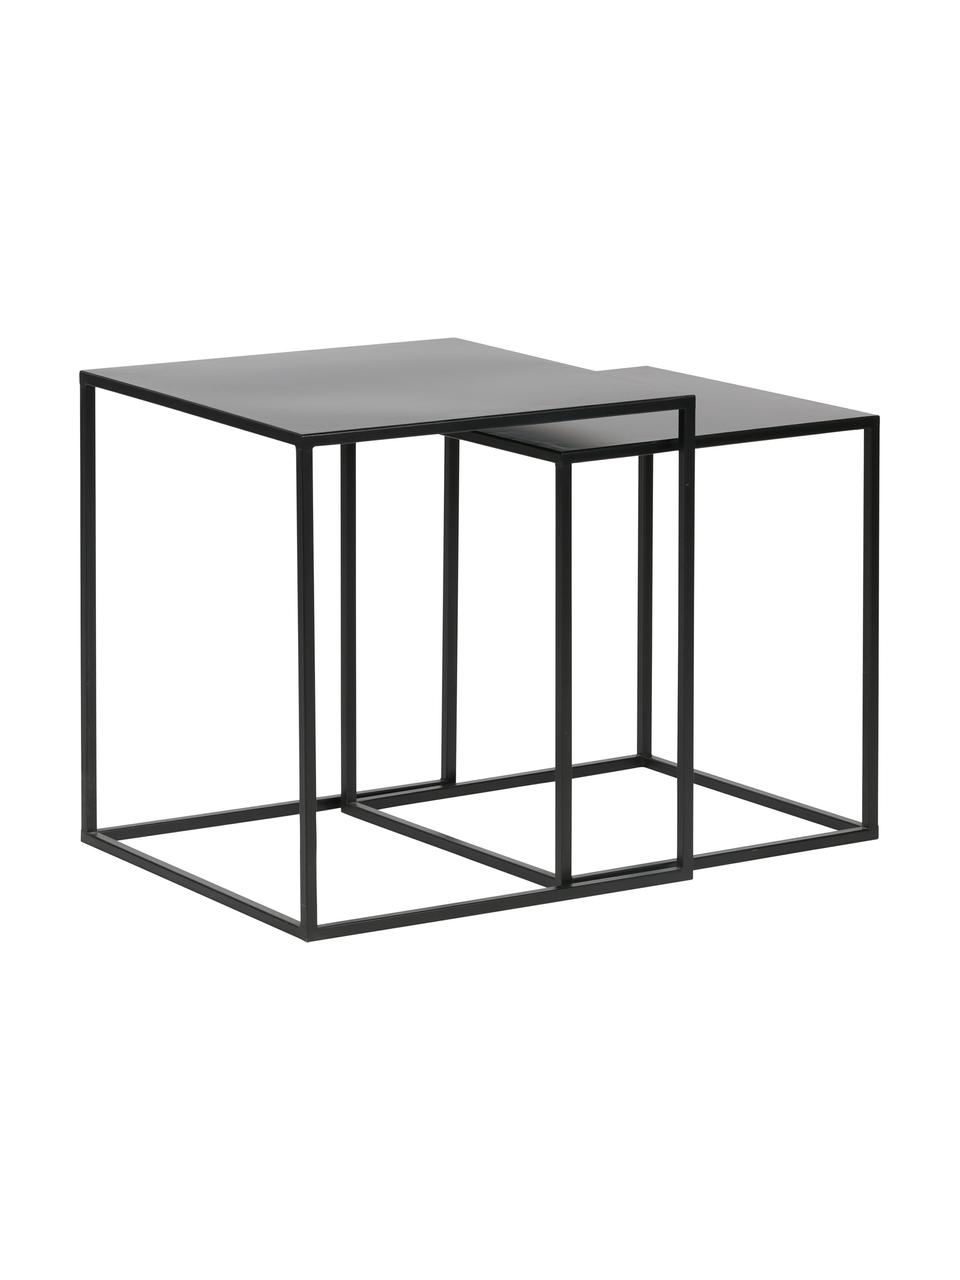 Set 2 tavolini in metallo Ziva, Metallo verniciato, Nero opaco, Set in varie misure